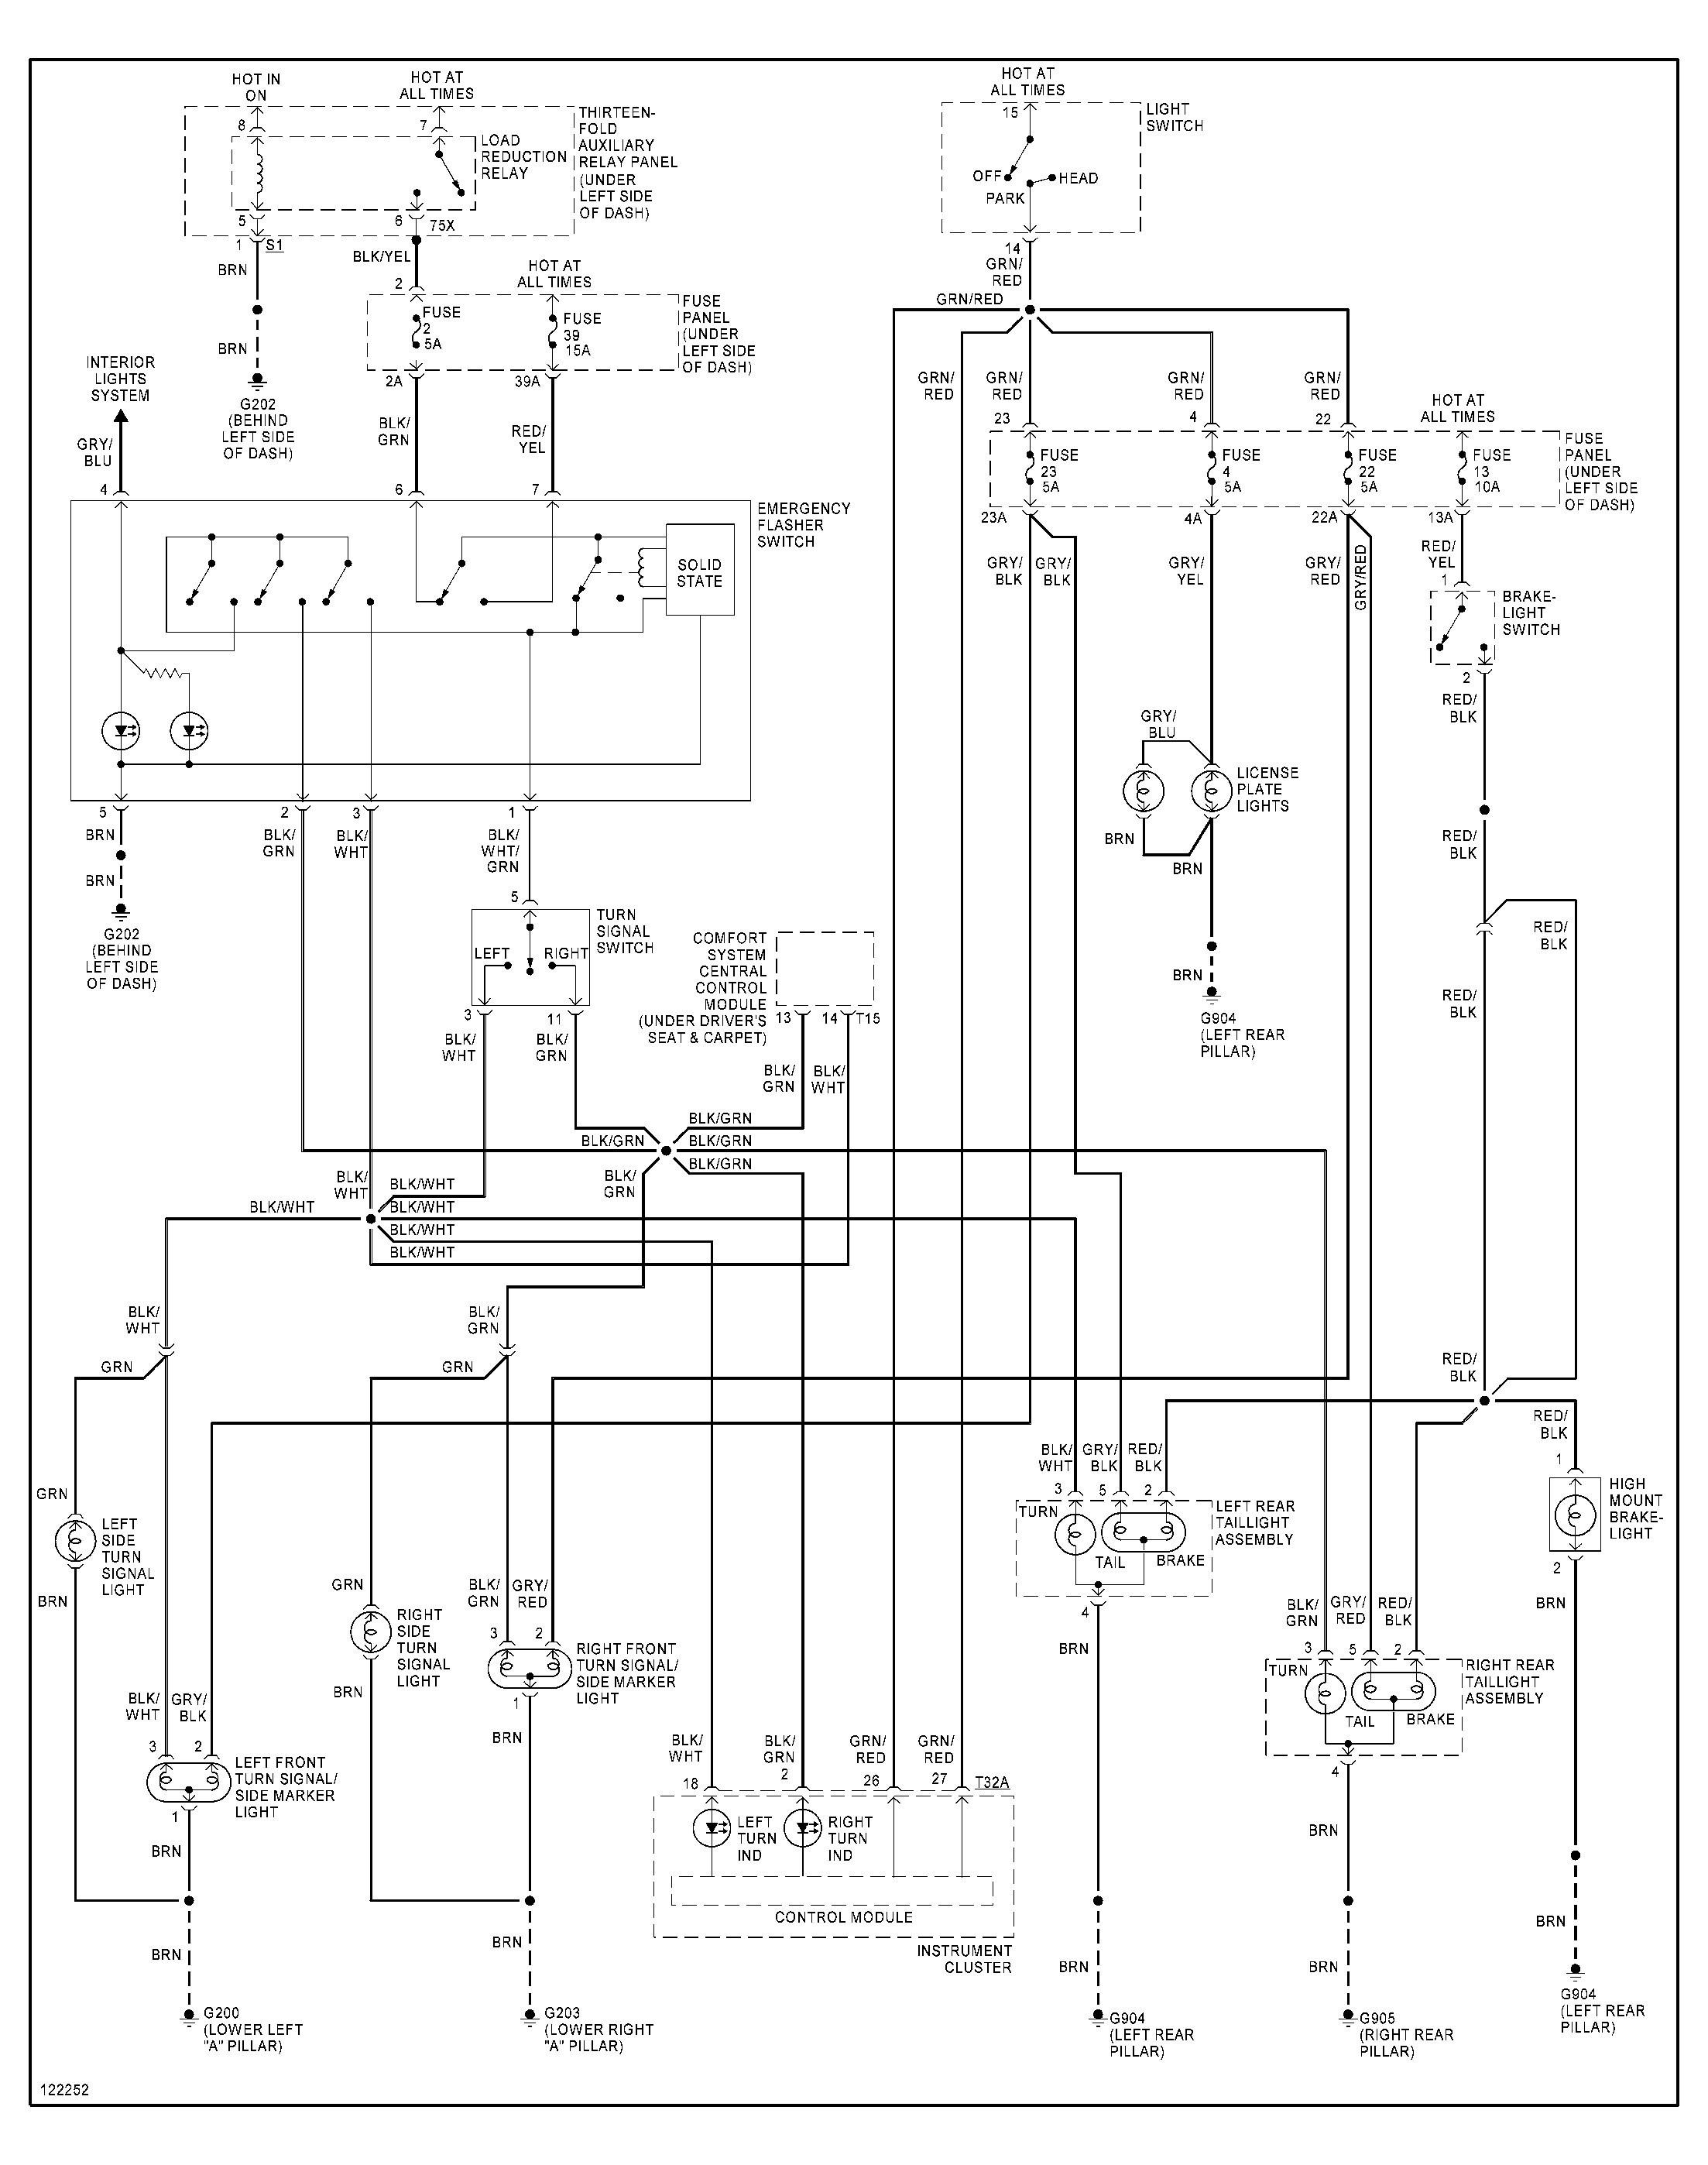 Vw Polo Engine Diagram Collection Vw Polo Wiring Diagram Diagrams Wiring Diagrams • Of Vw Polo Engine Diagram